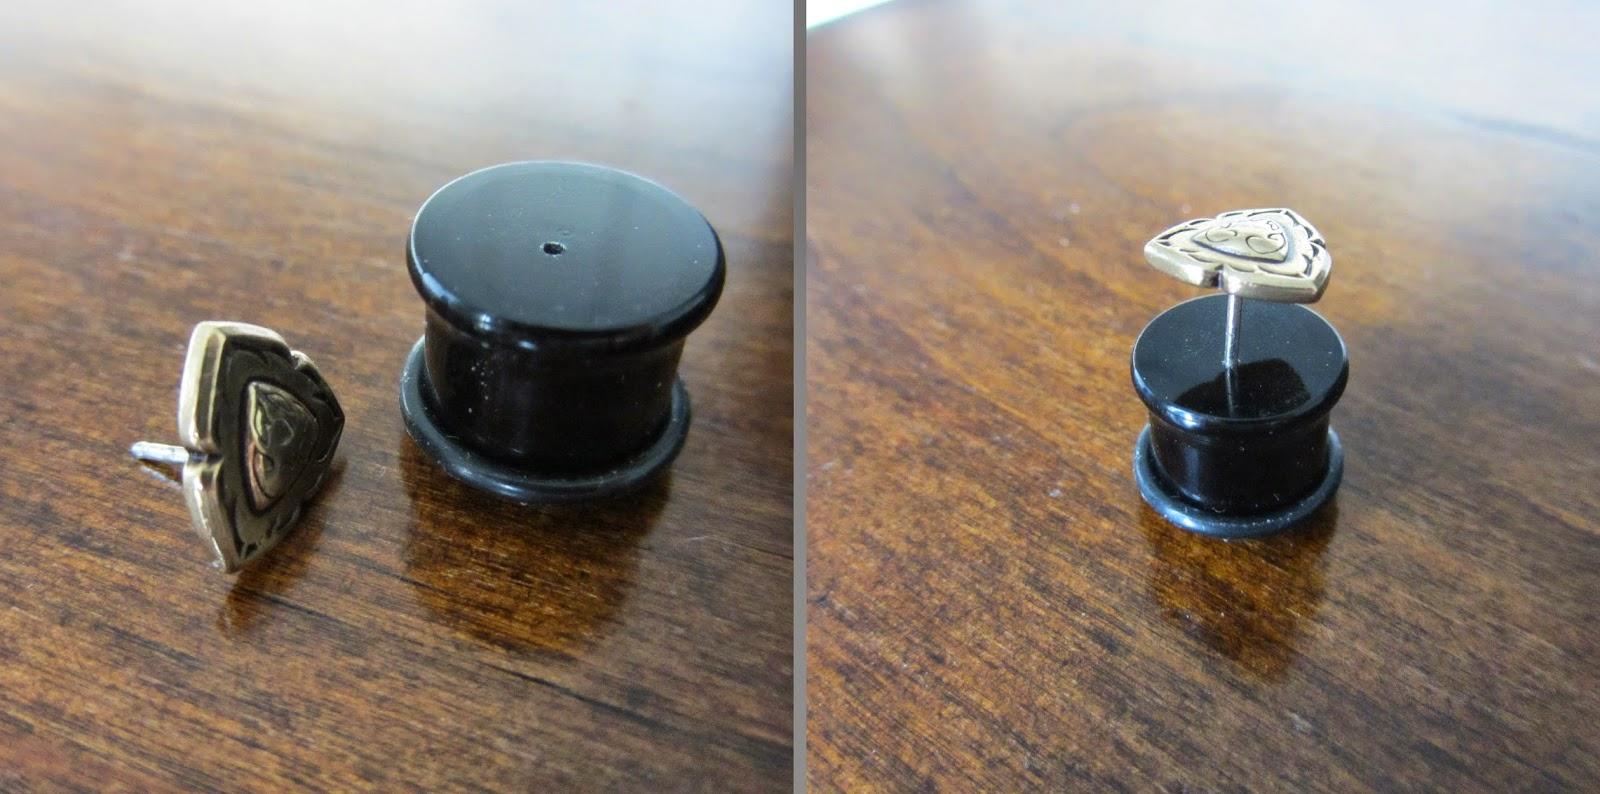 Koala Art And Design Plug Earring Converter : Not another plug earring converter ehkä paras